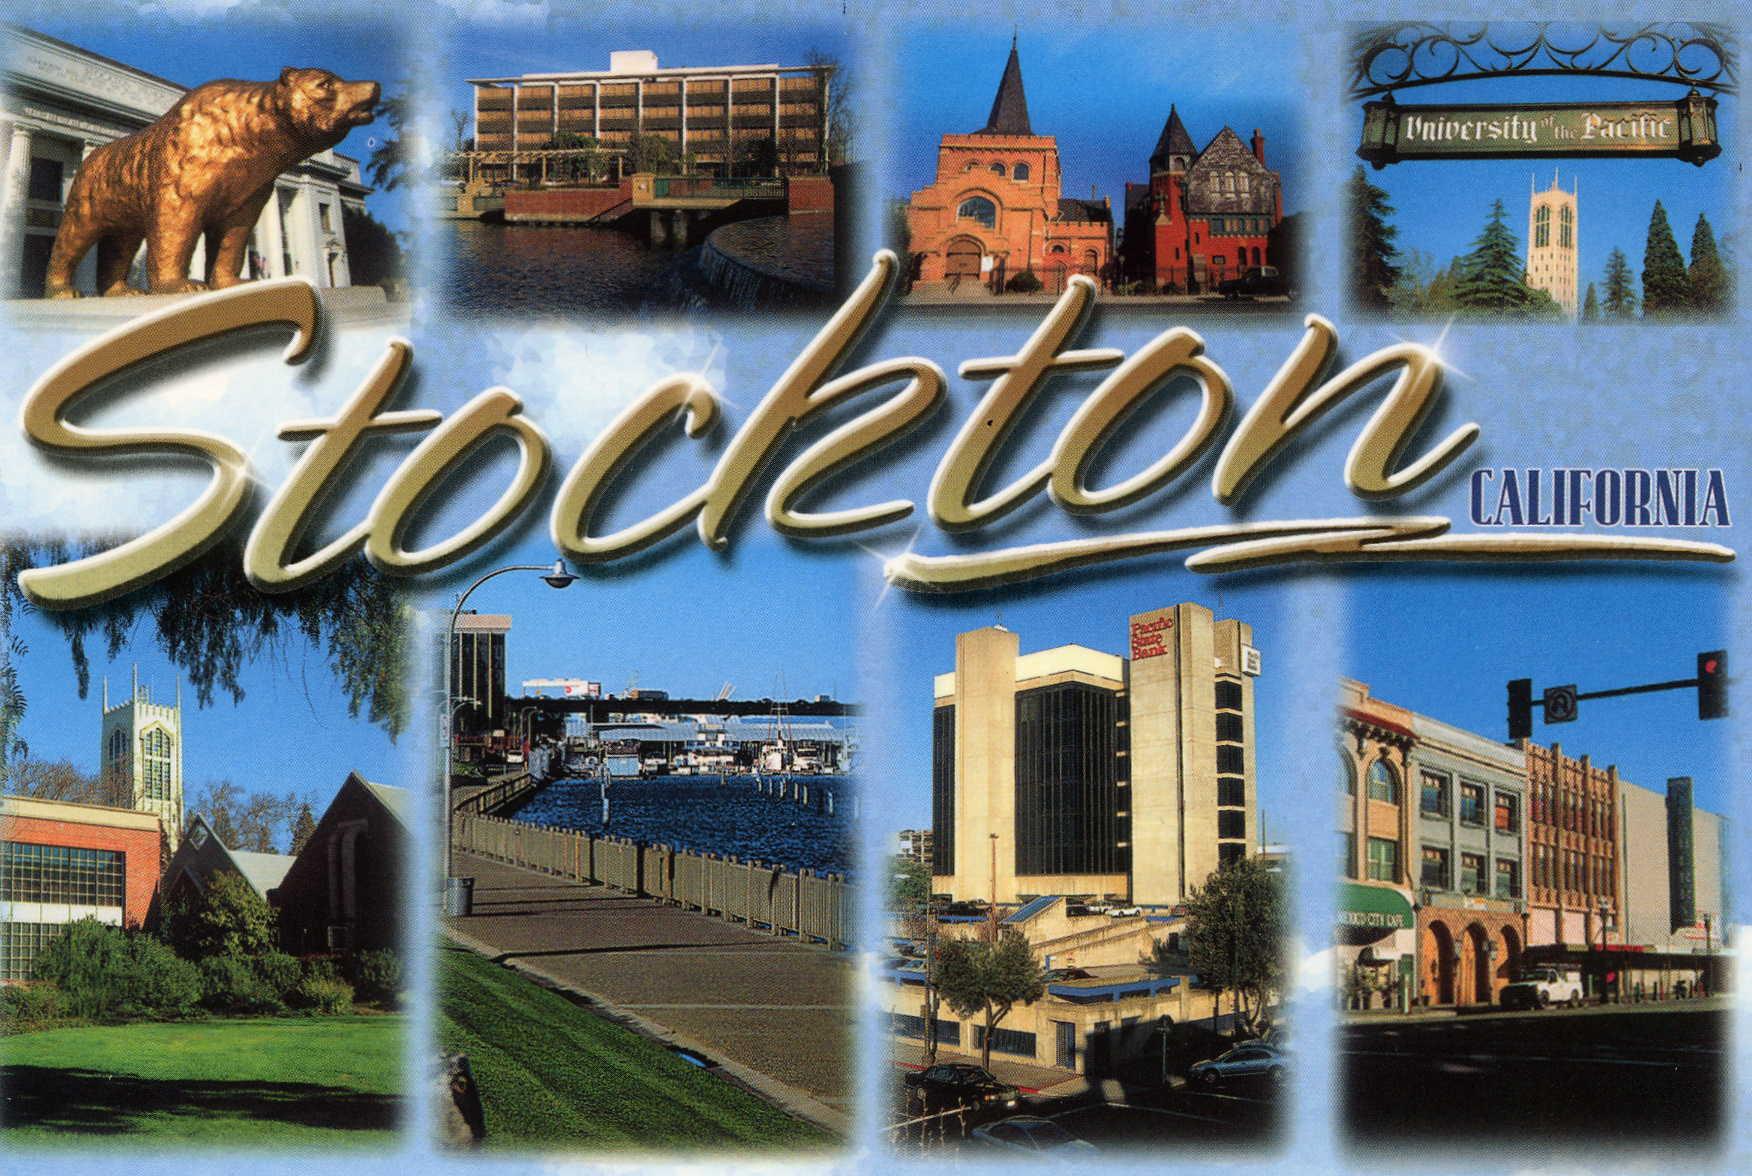 Six Sigma Stockton